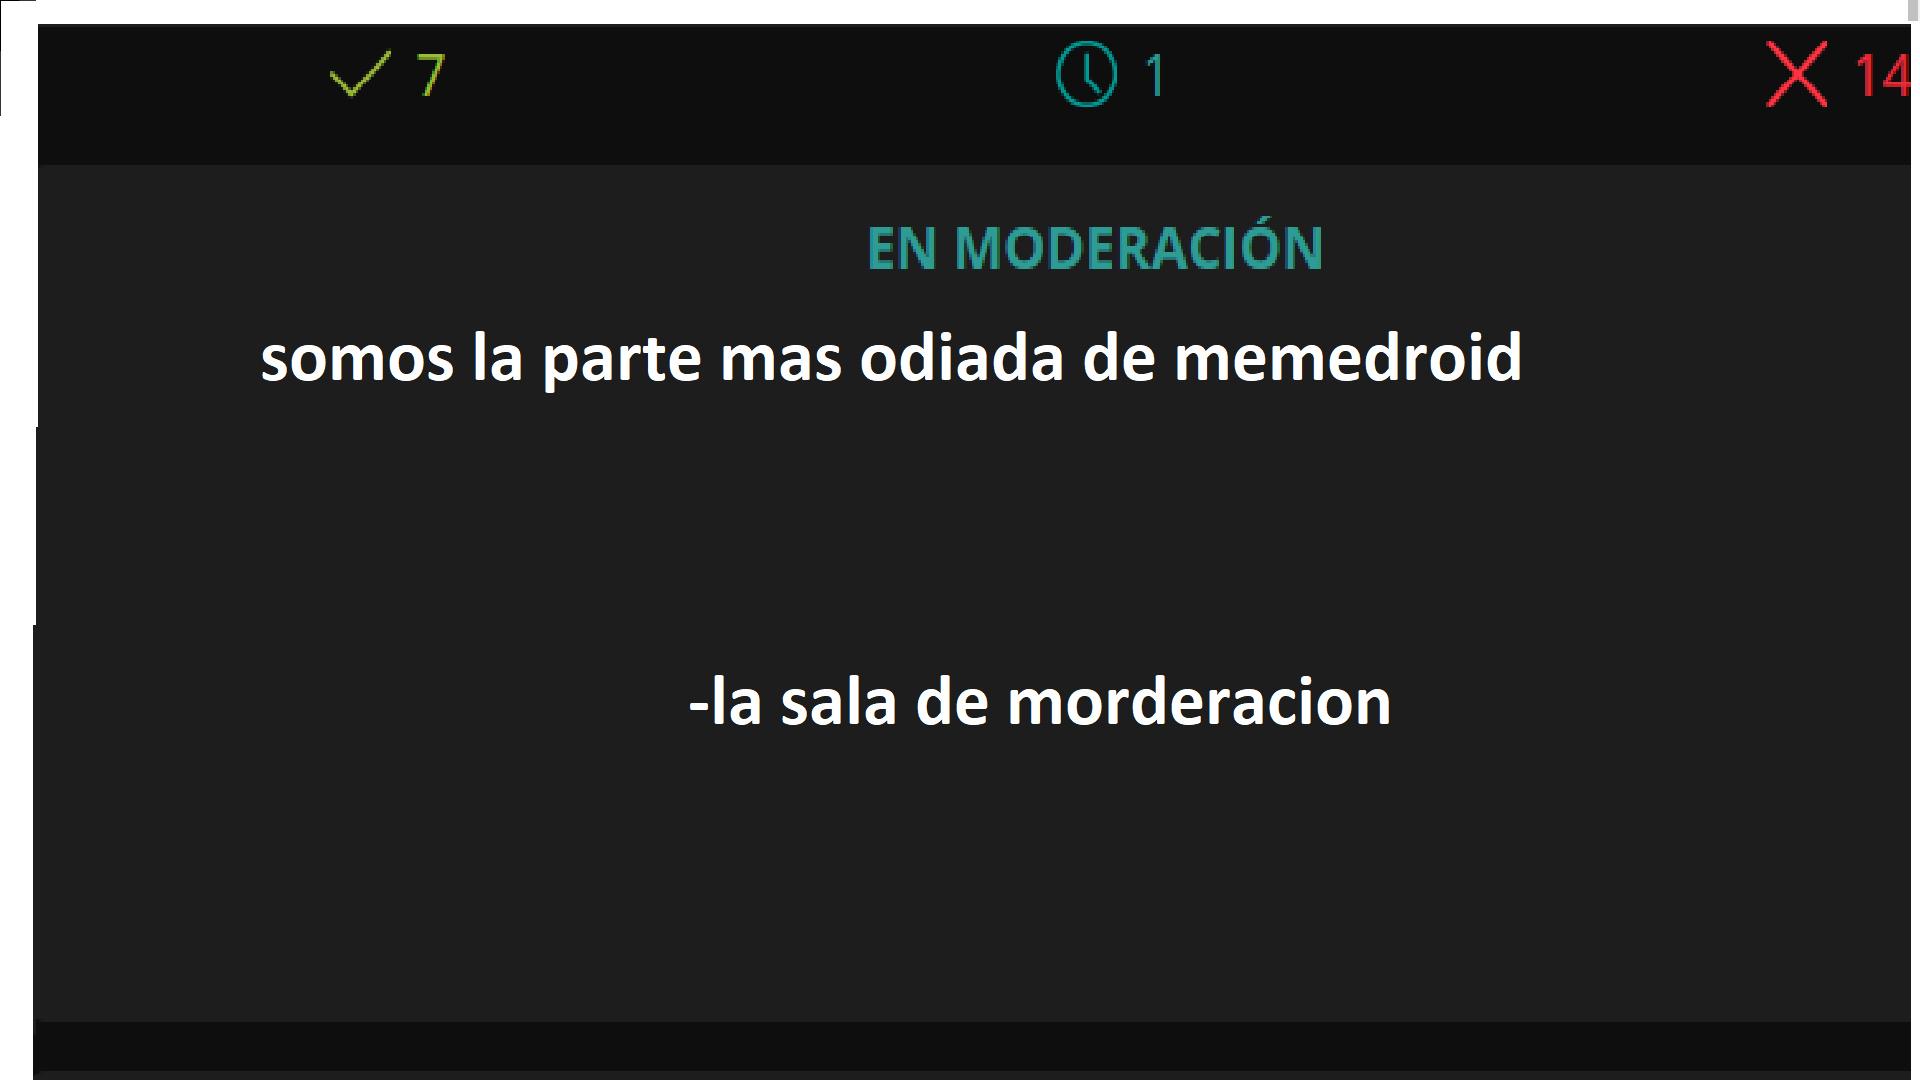 somos de moderadores :) - meme